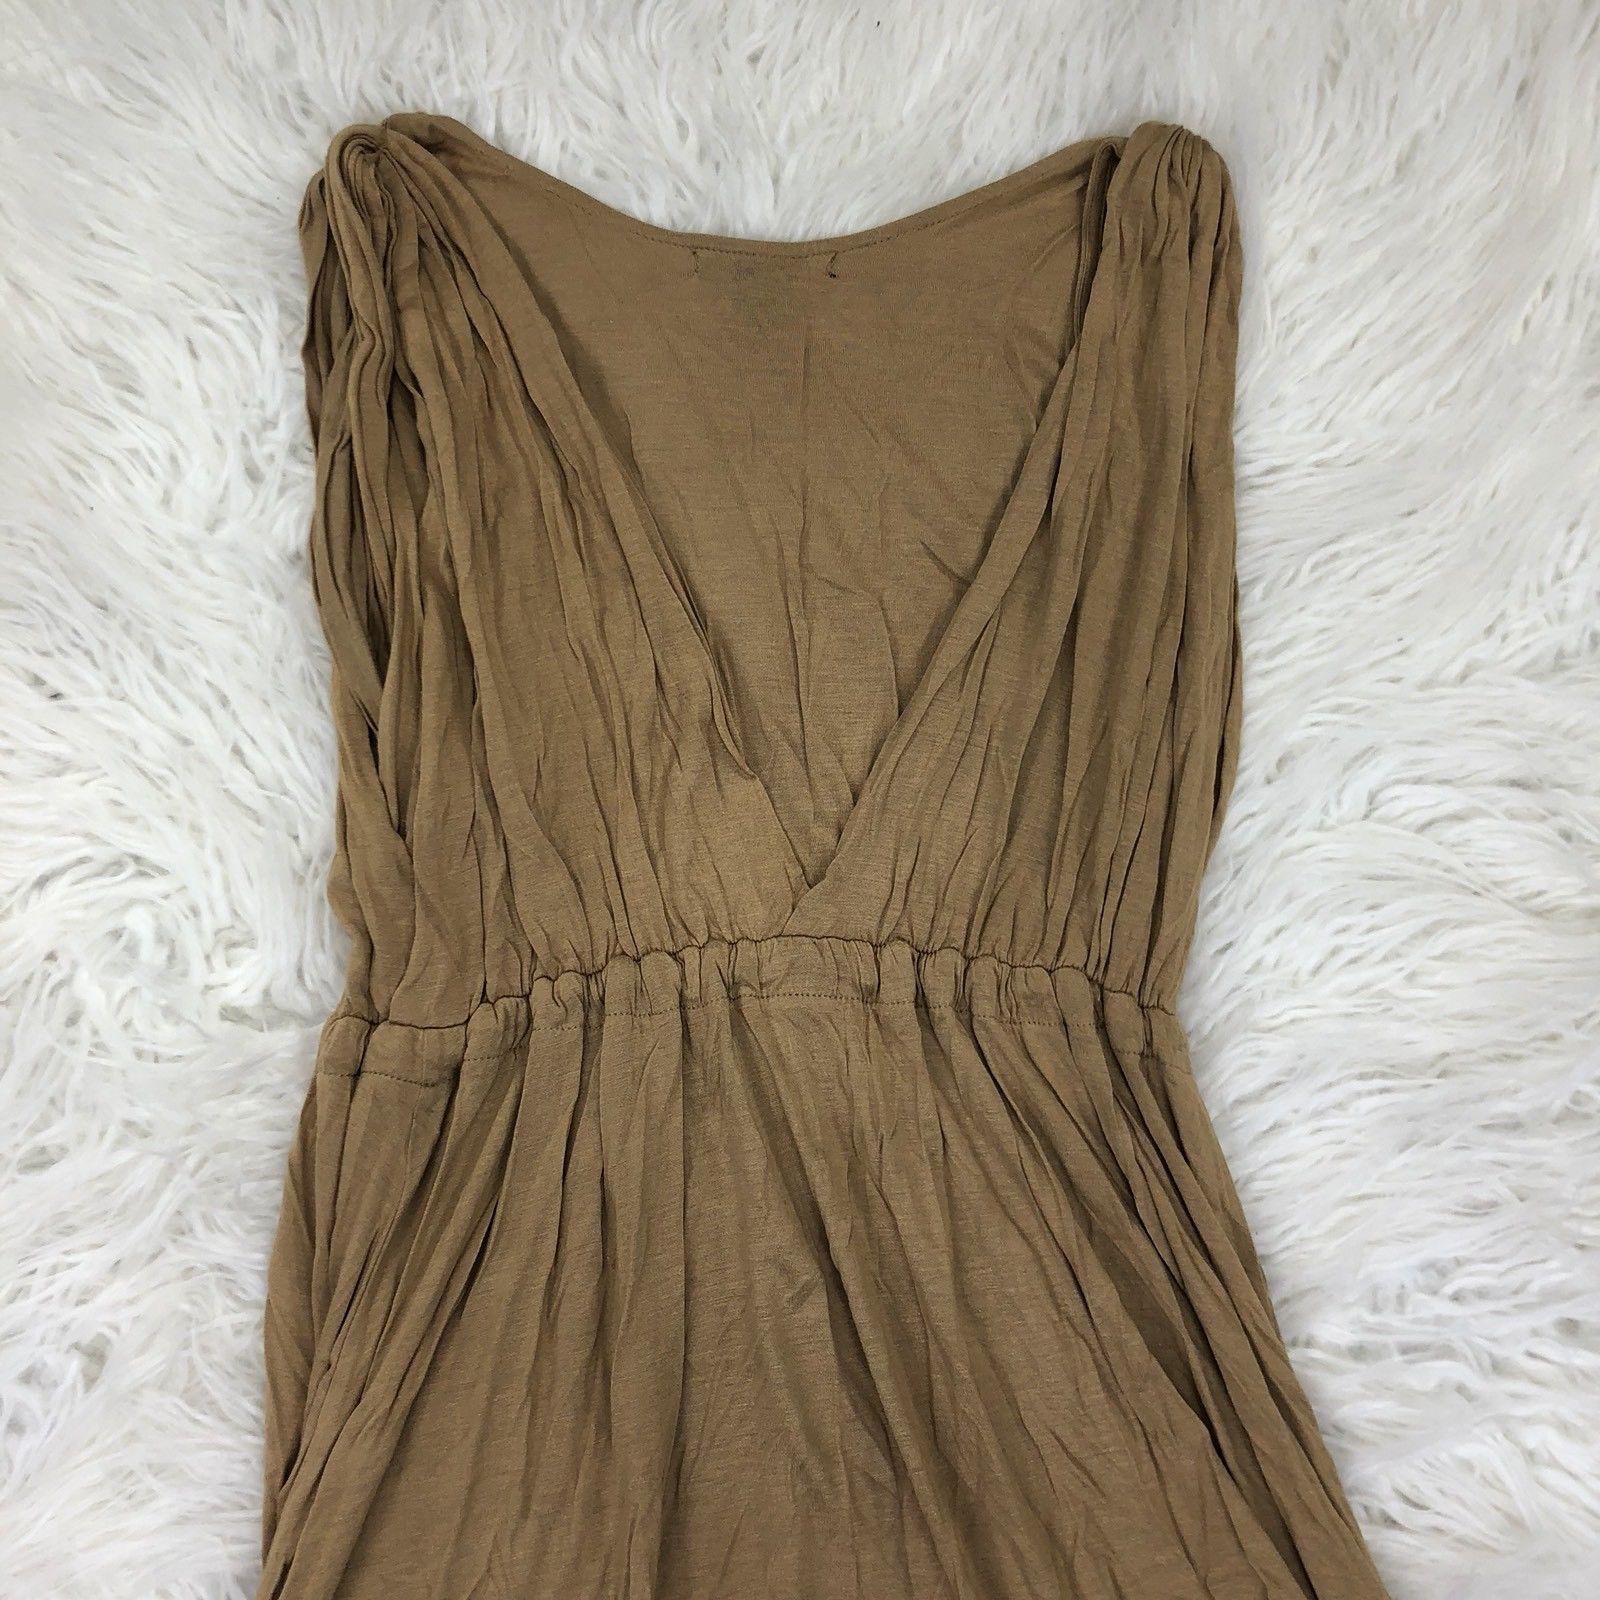 BCBG Maxazria Women's Medium Brown Viscose Wrap Dress